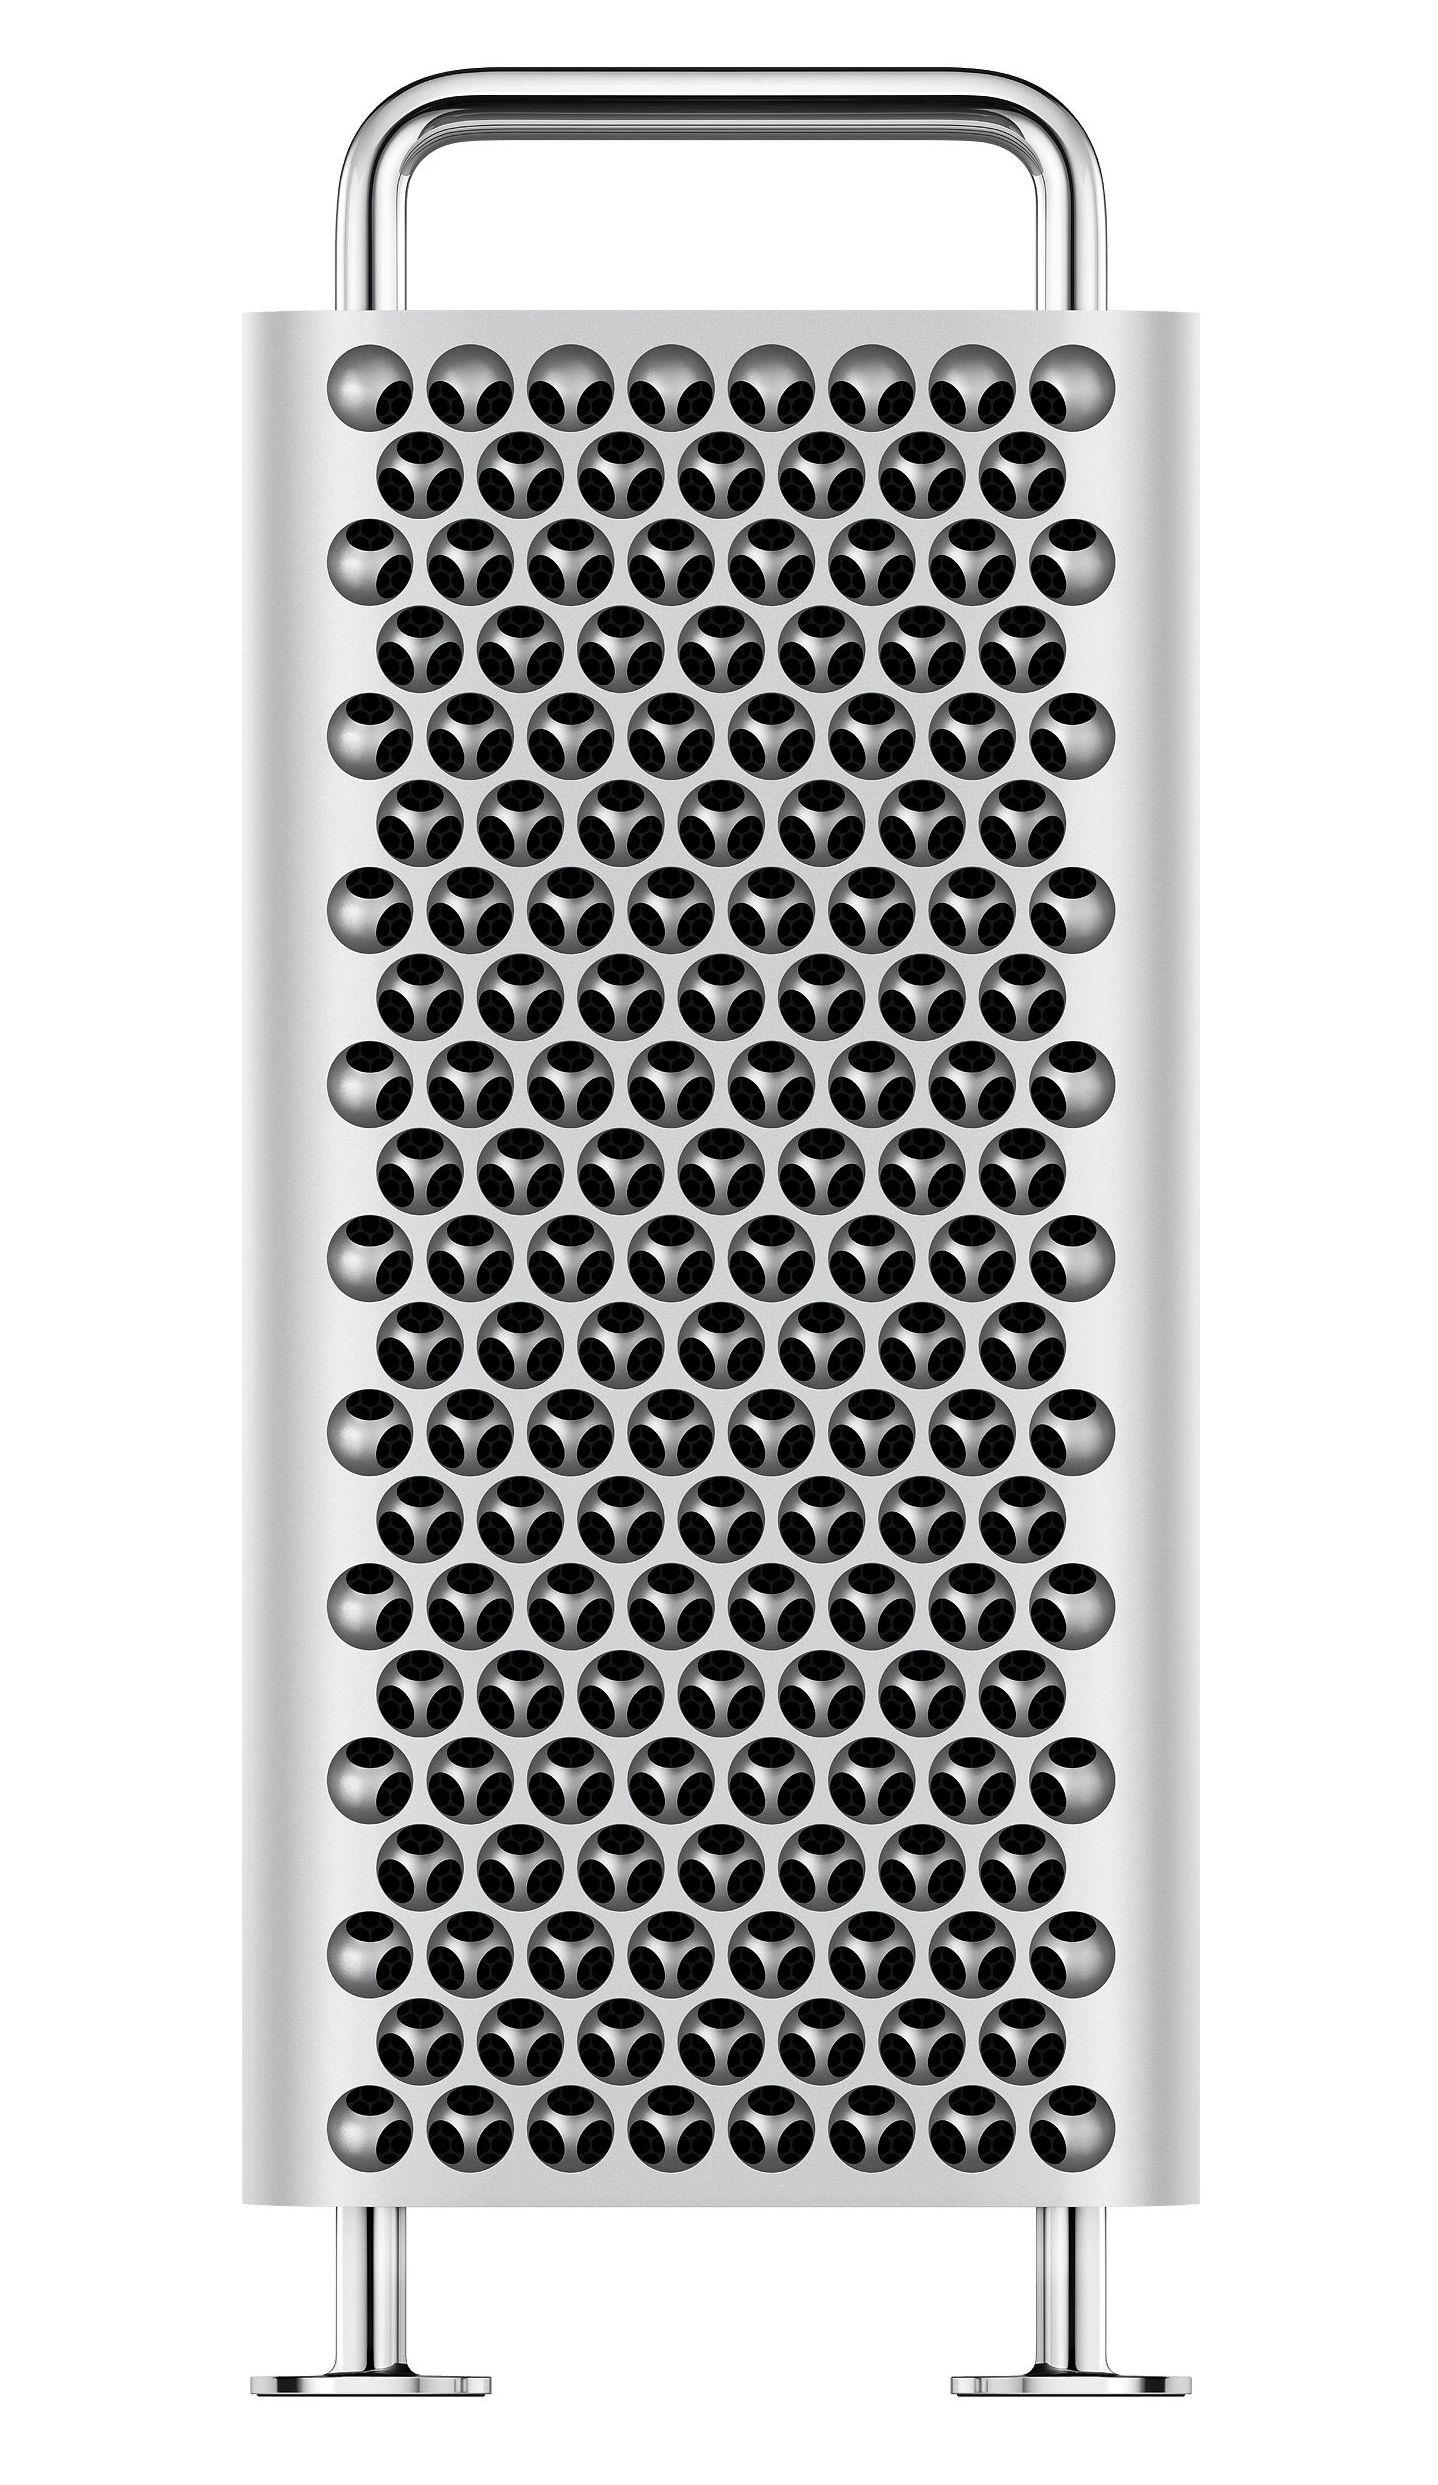 Mac Pro - 3,5-GHz 8‑core processor - 32 GB geheugen - 256 GB SSD (Nieuw)